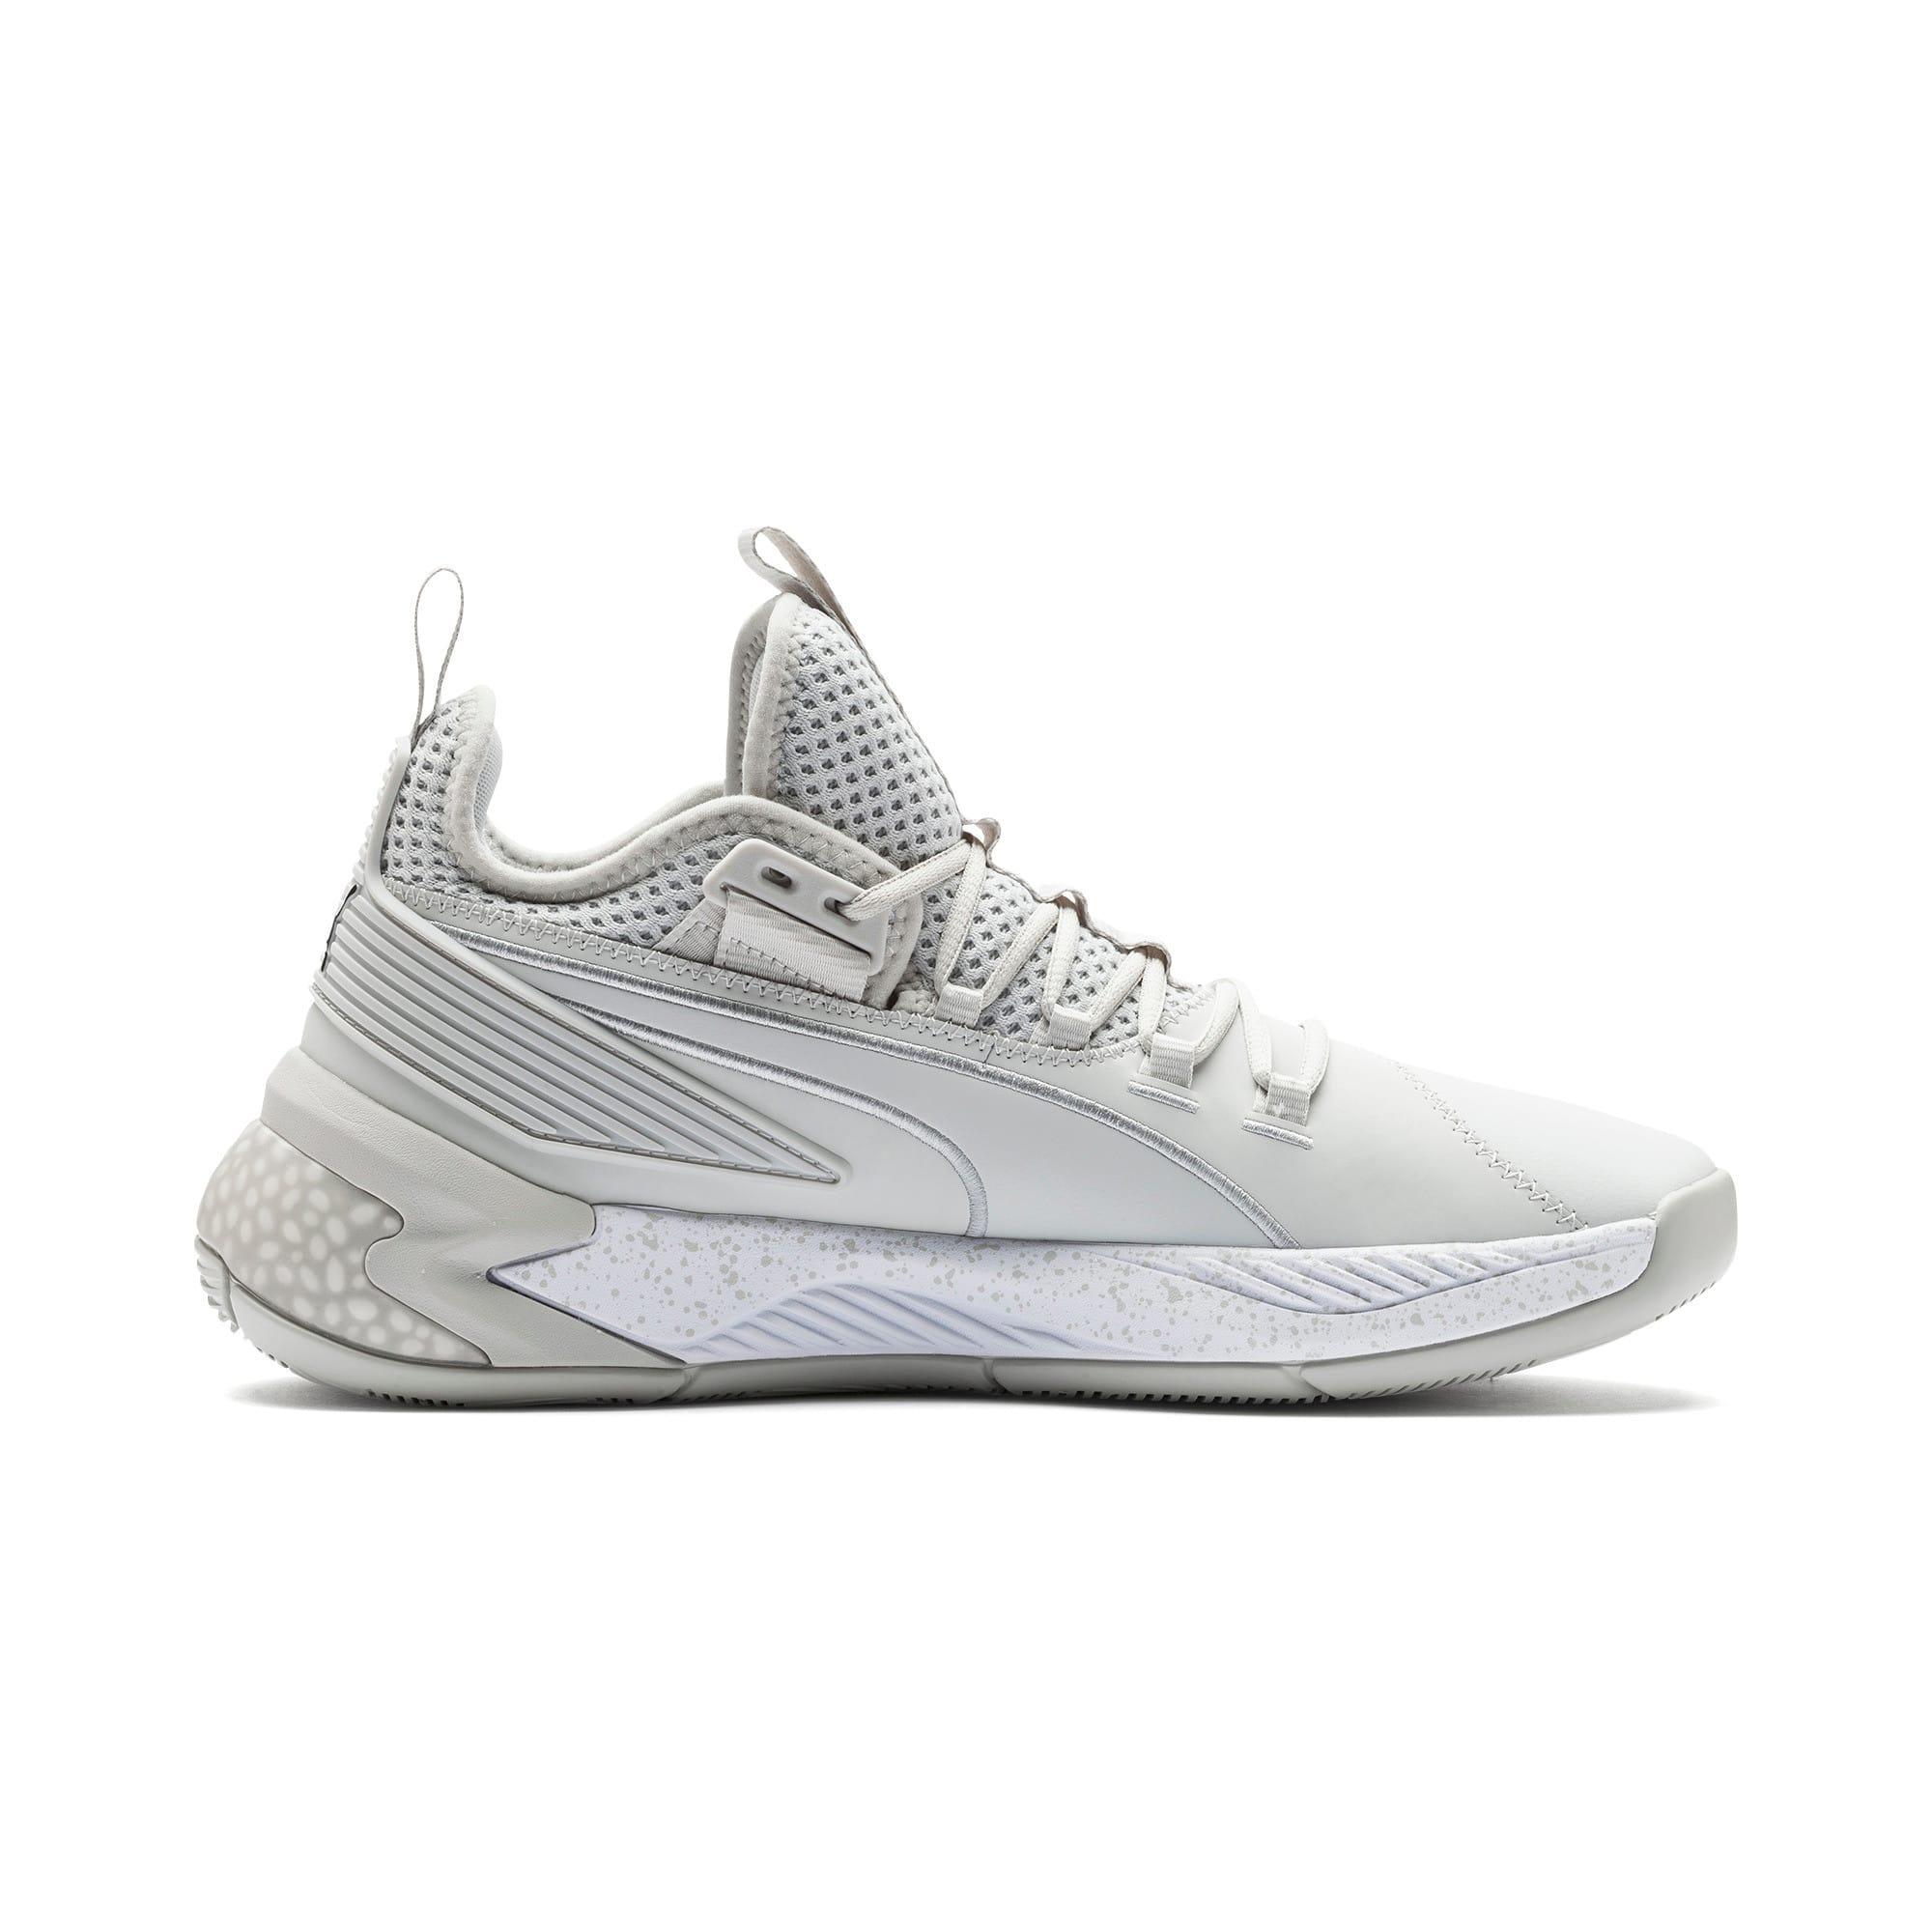 Thumbnail 5 of Uproar Core Men's Basketball Shoes, Glacier Gray, medium